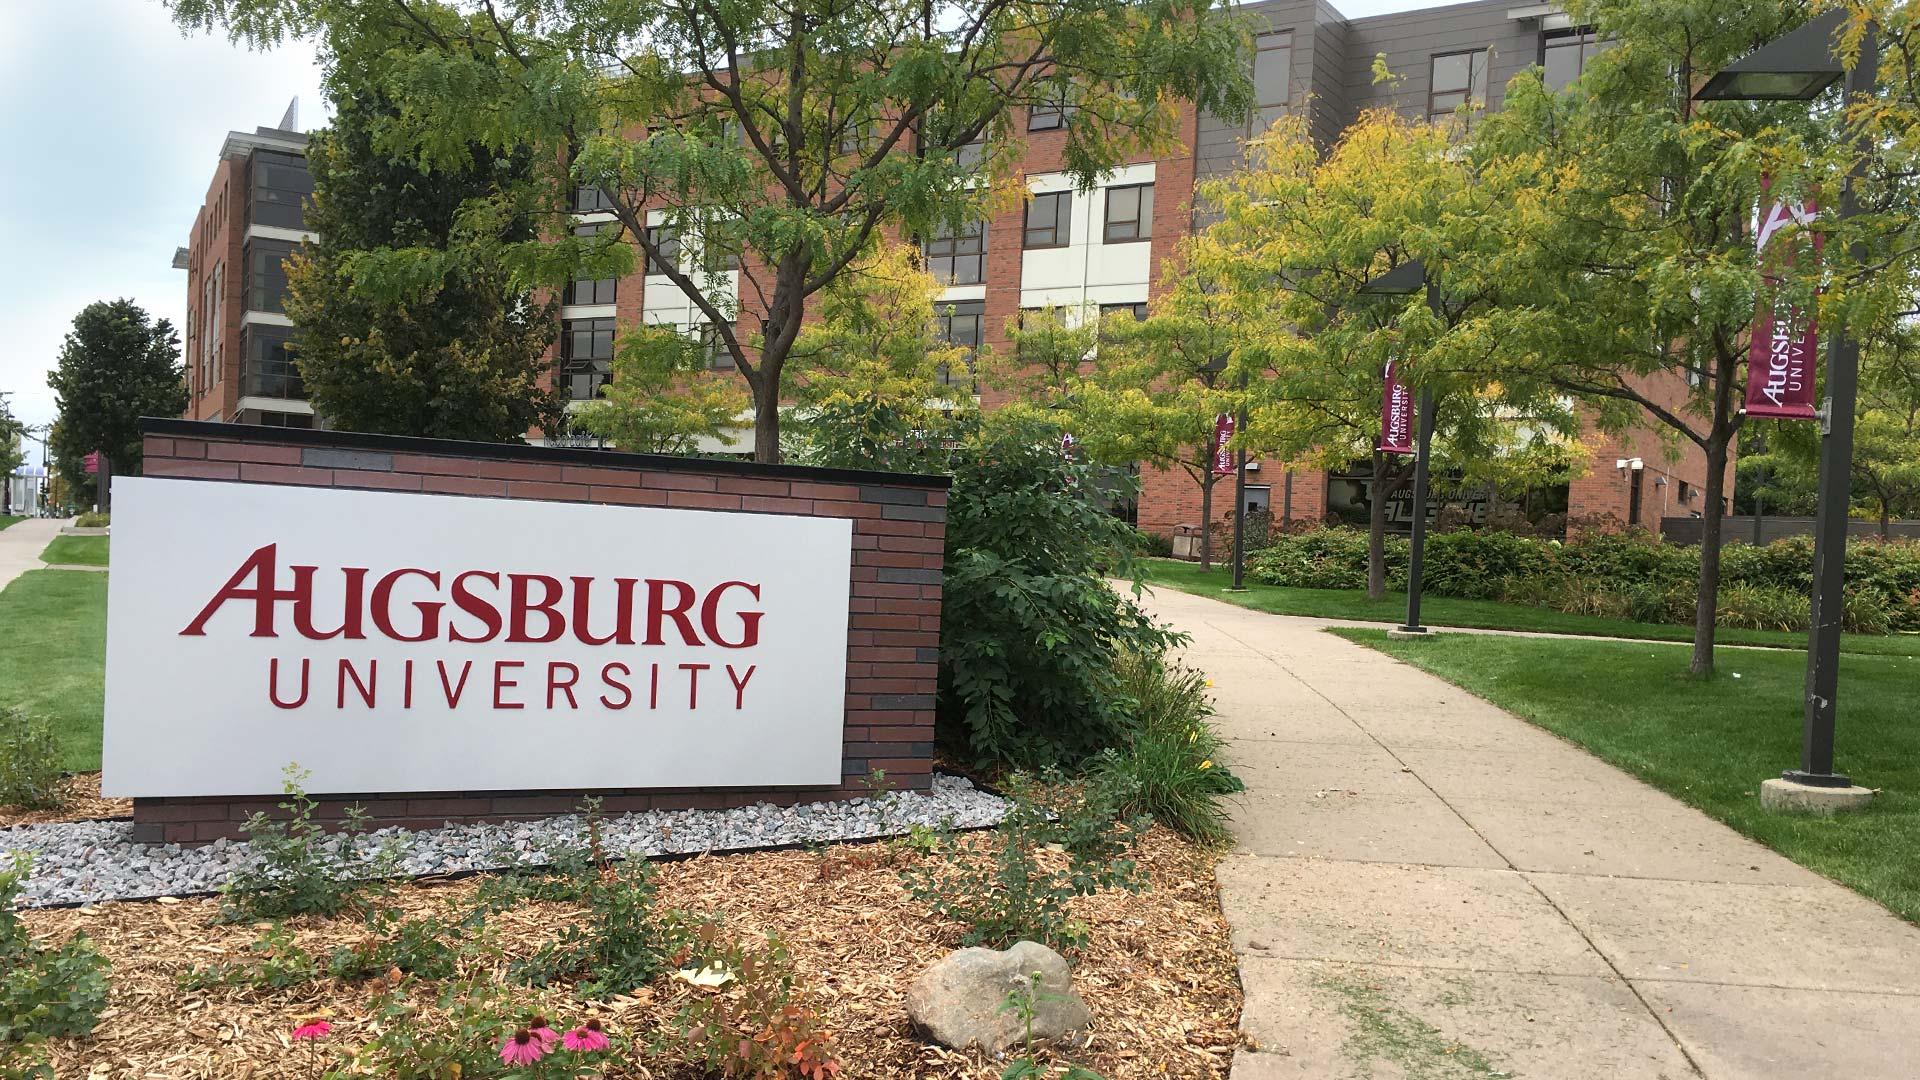 Augsburg University